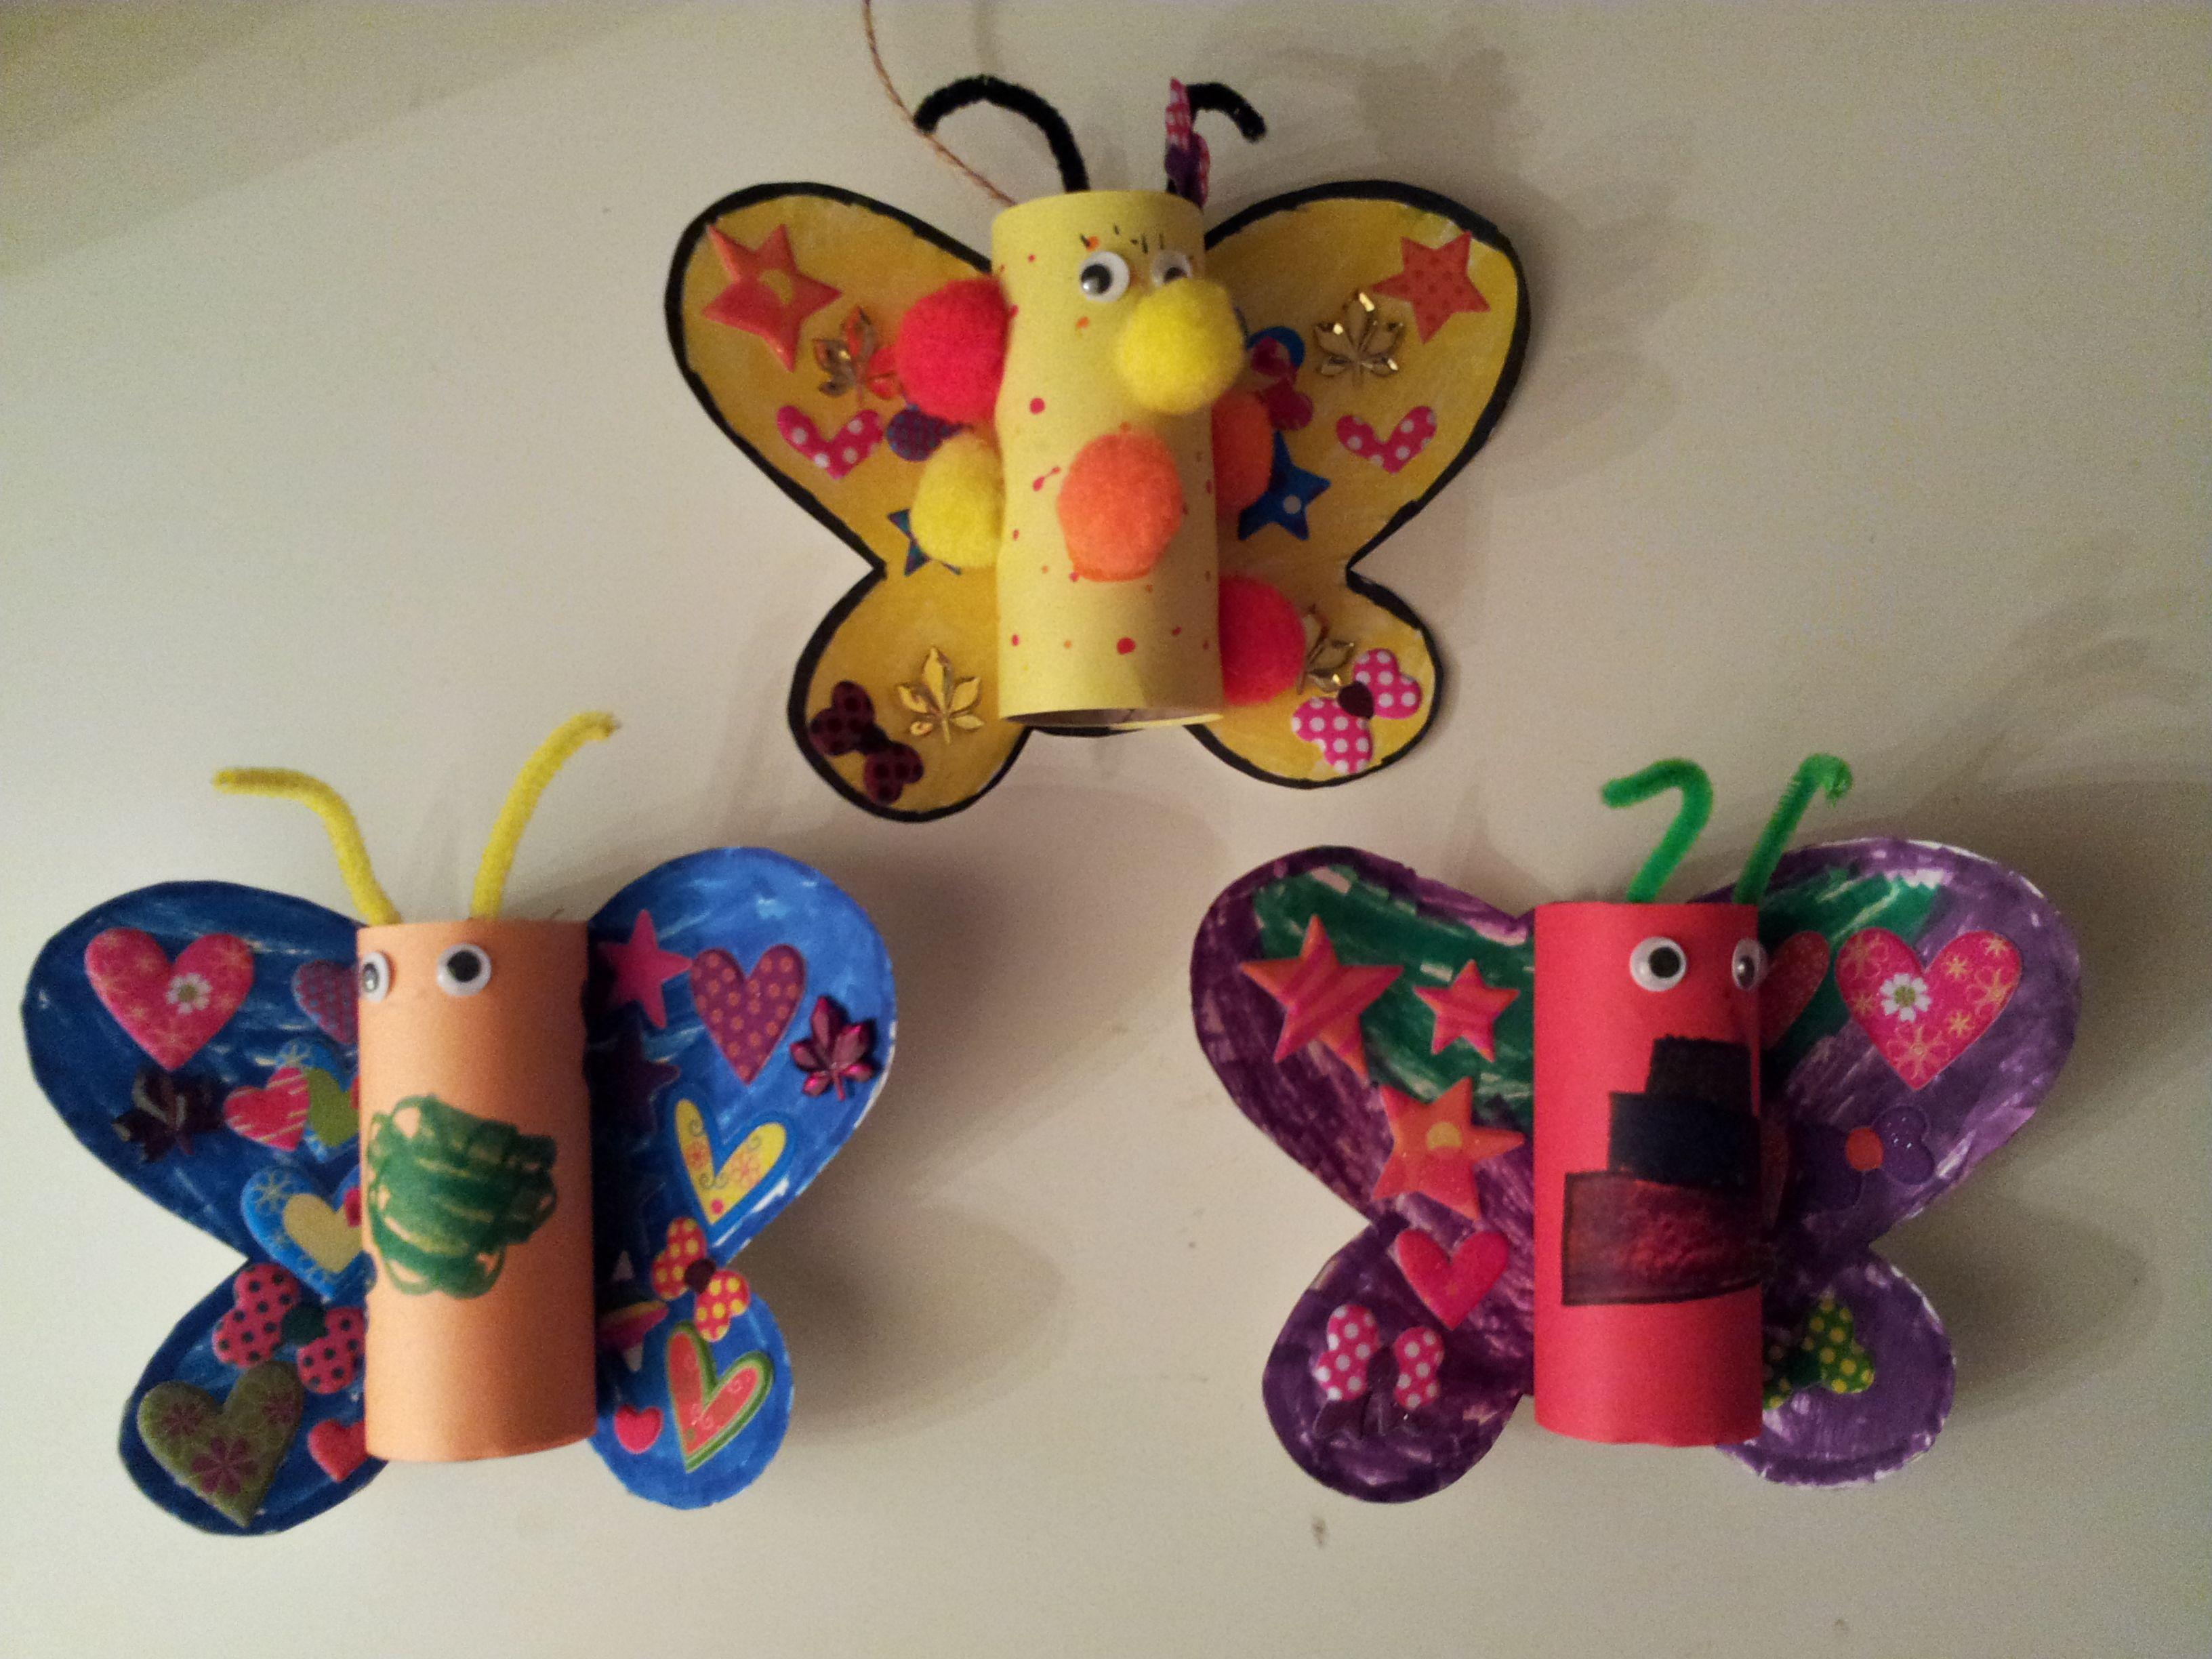 notre bricolage avec mes petits enfants inspir de pinterest diy id es d co id es cadeaux. Black Bedroom Furniture Sets. Home Design Ideas